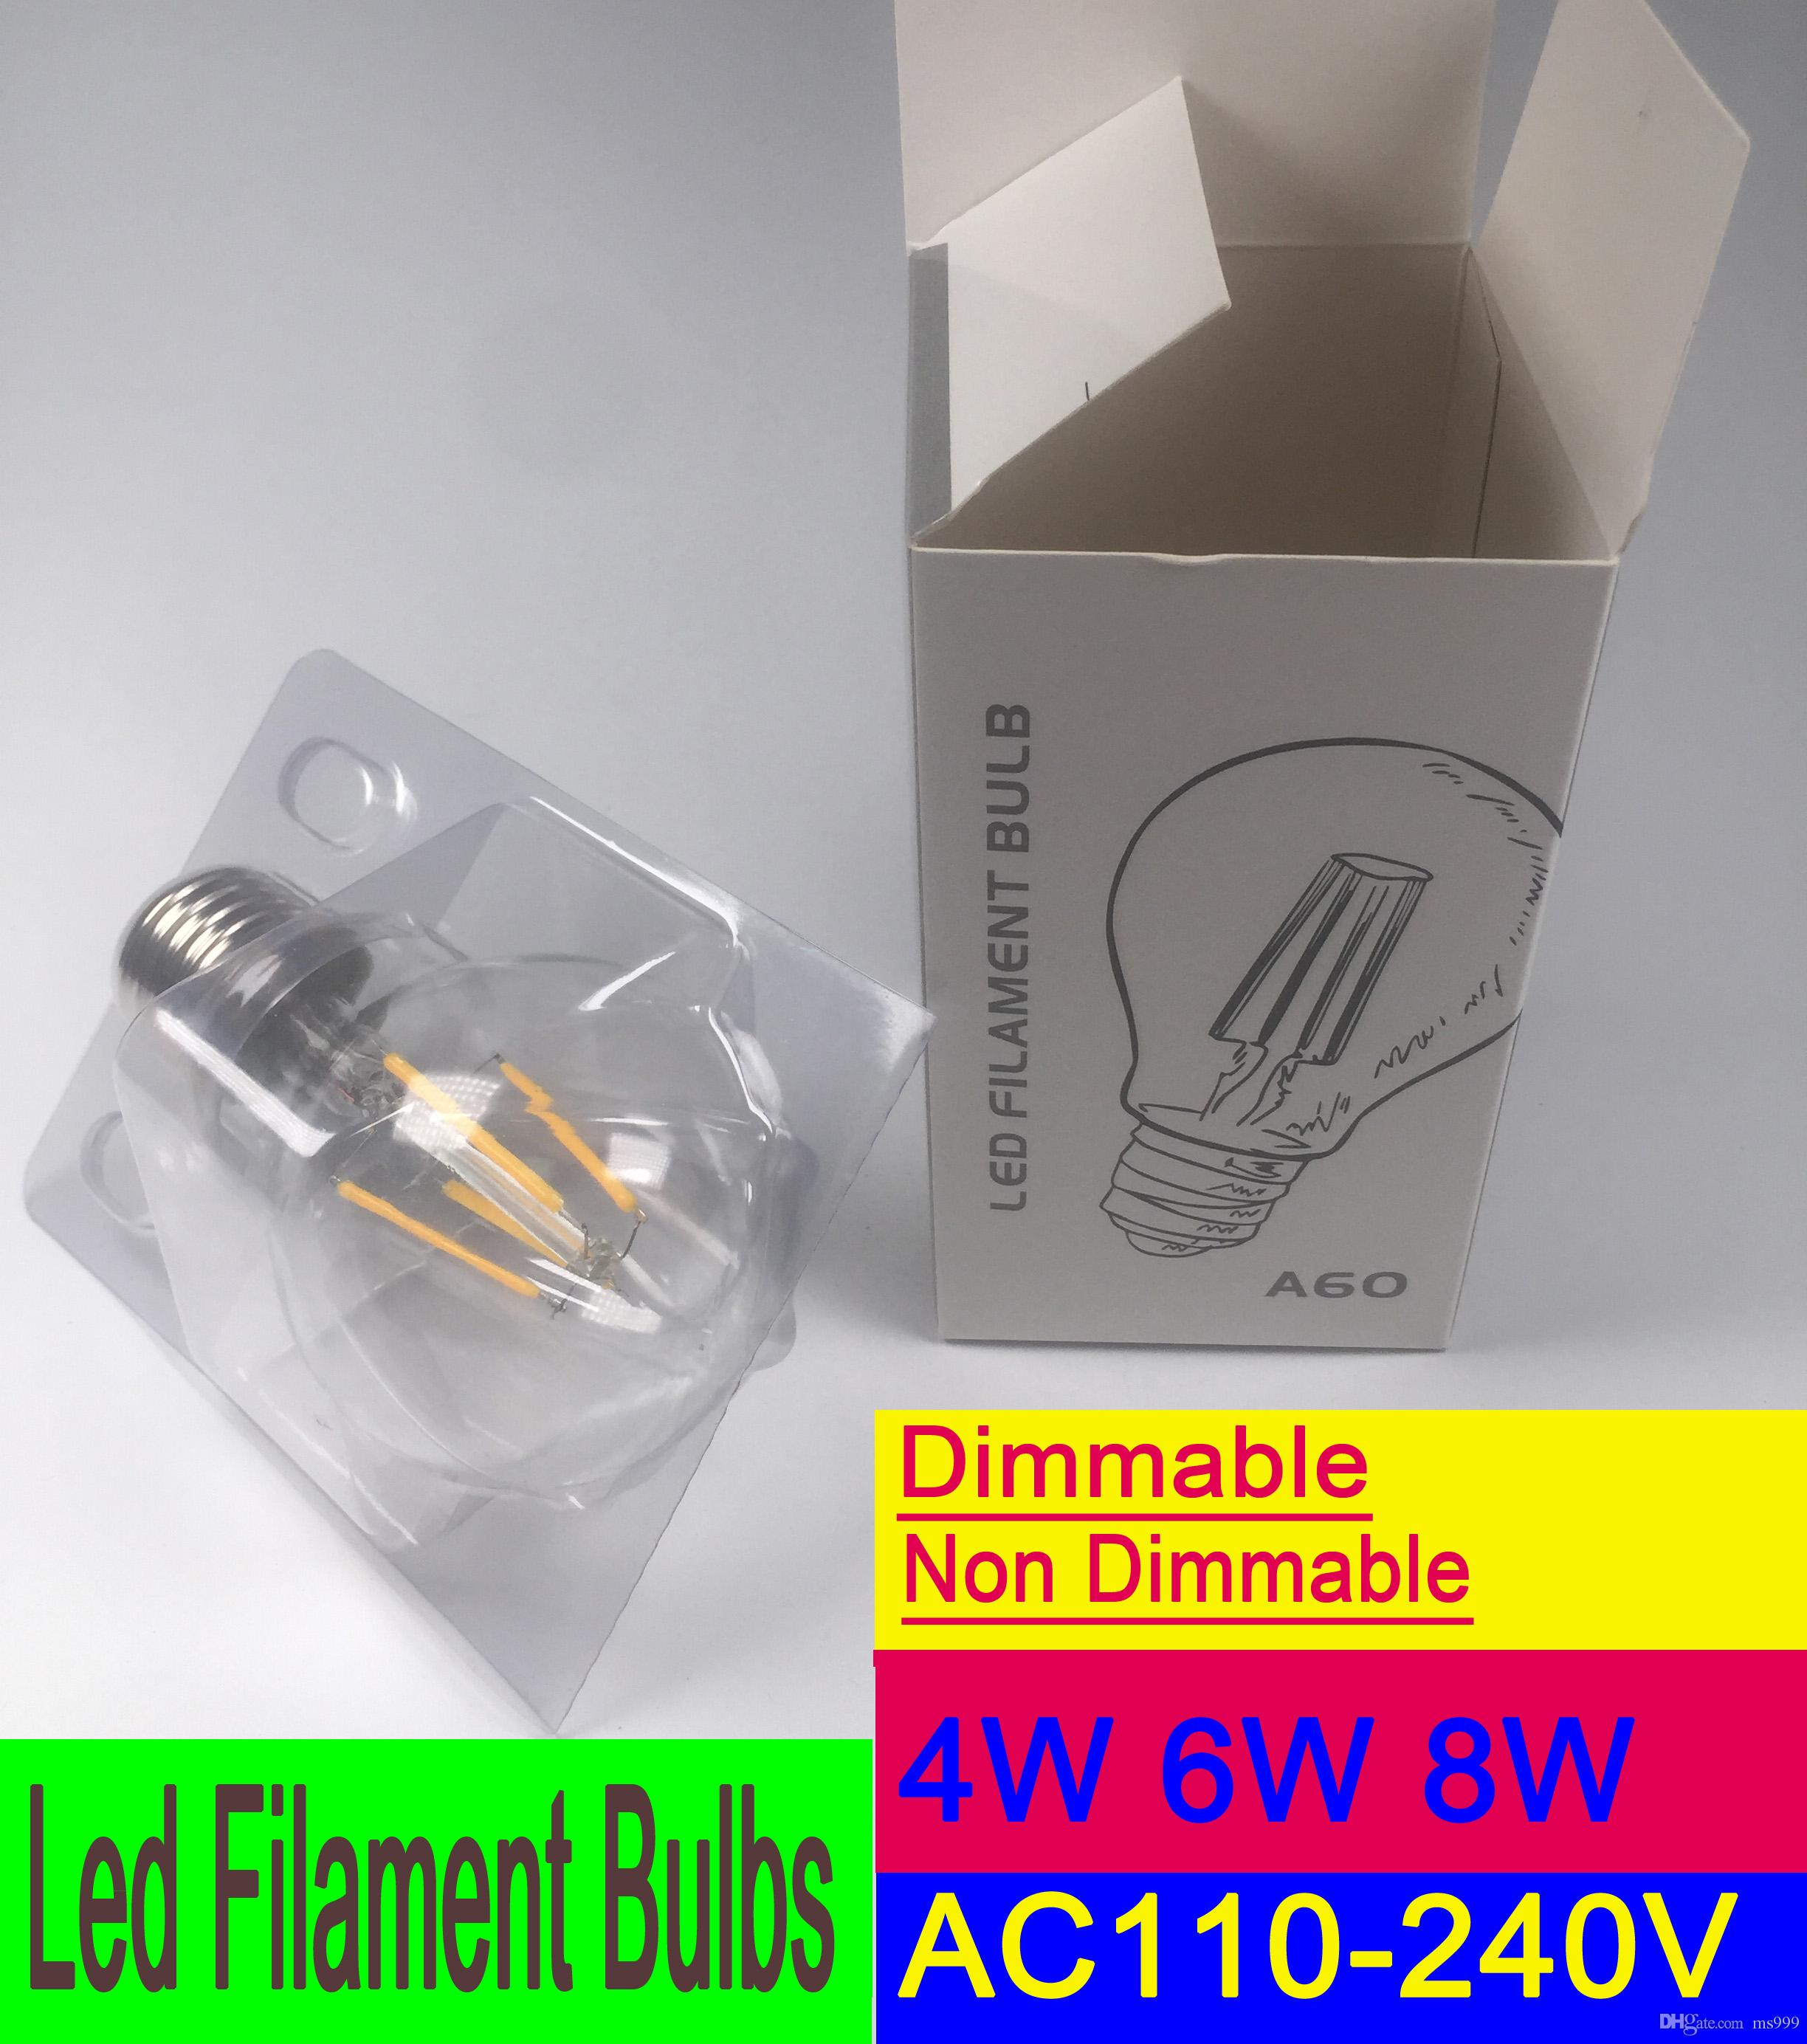 Vintage edison bulb old fashioned lamp classic a60 led 2w or 4w - Best Vintage Led Filament Bulbs Led E26 E27 B22 2w 4w 6w Warm White Cold White Light Bulb Edison Classic A60 Dimmable Lighting Cfl Bulb Dimmable Led Bulbs